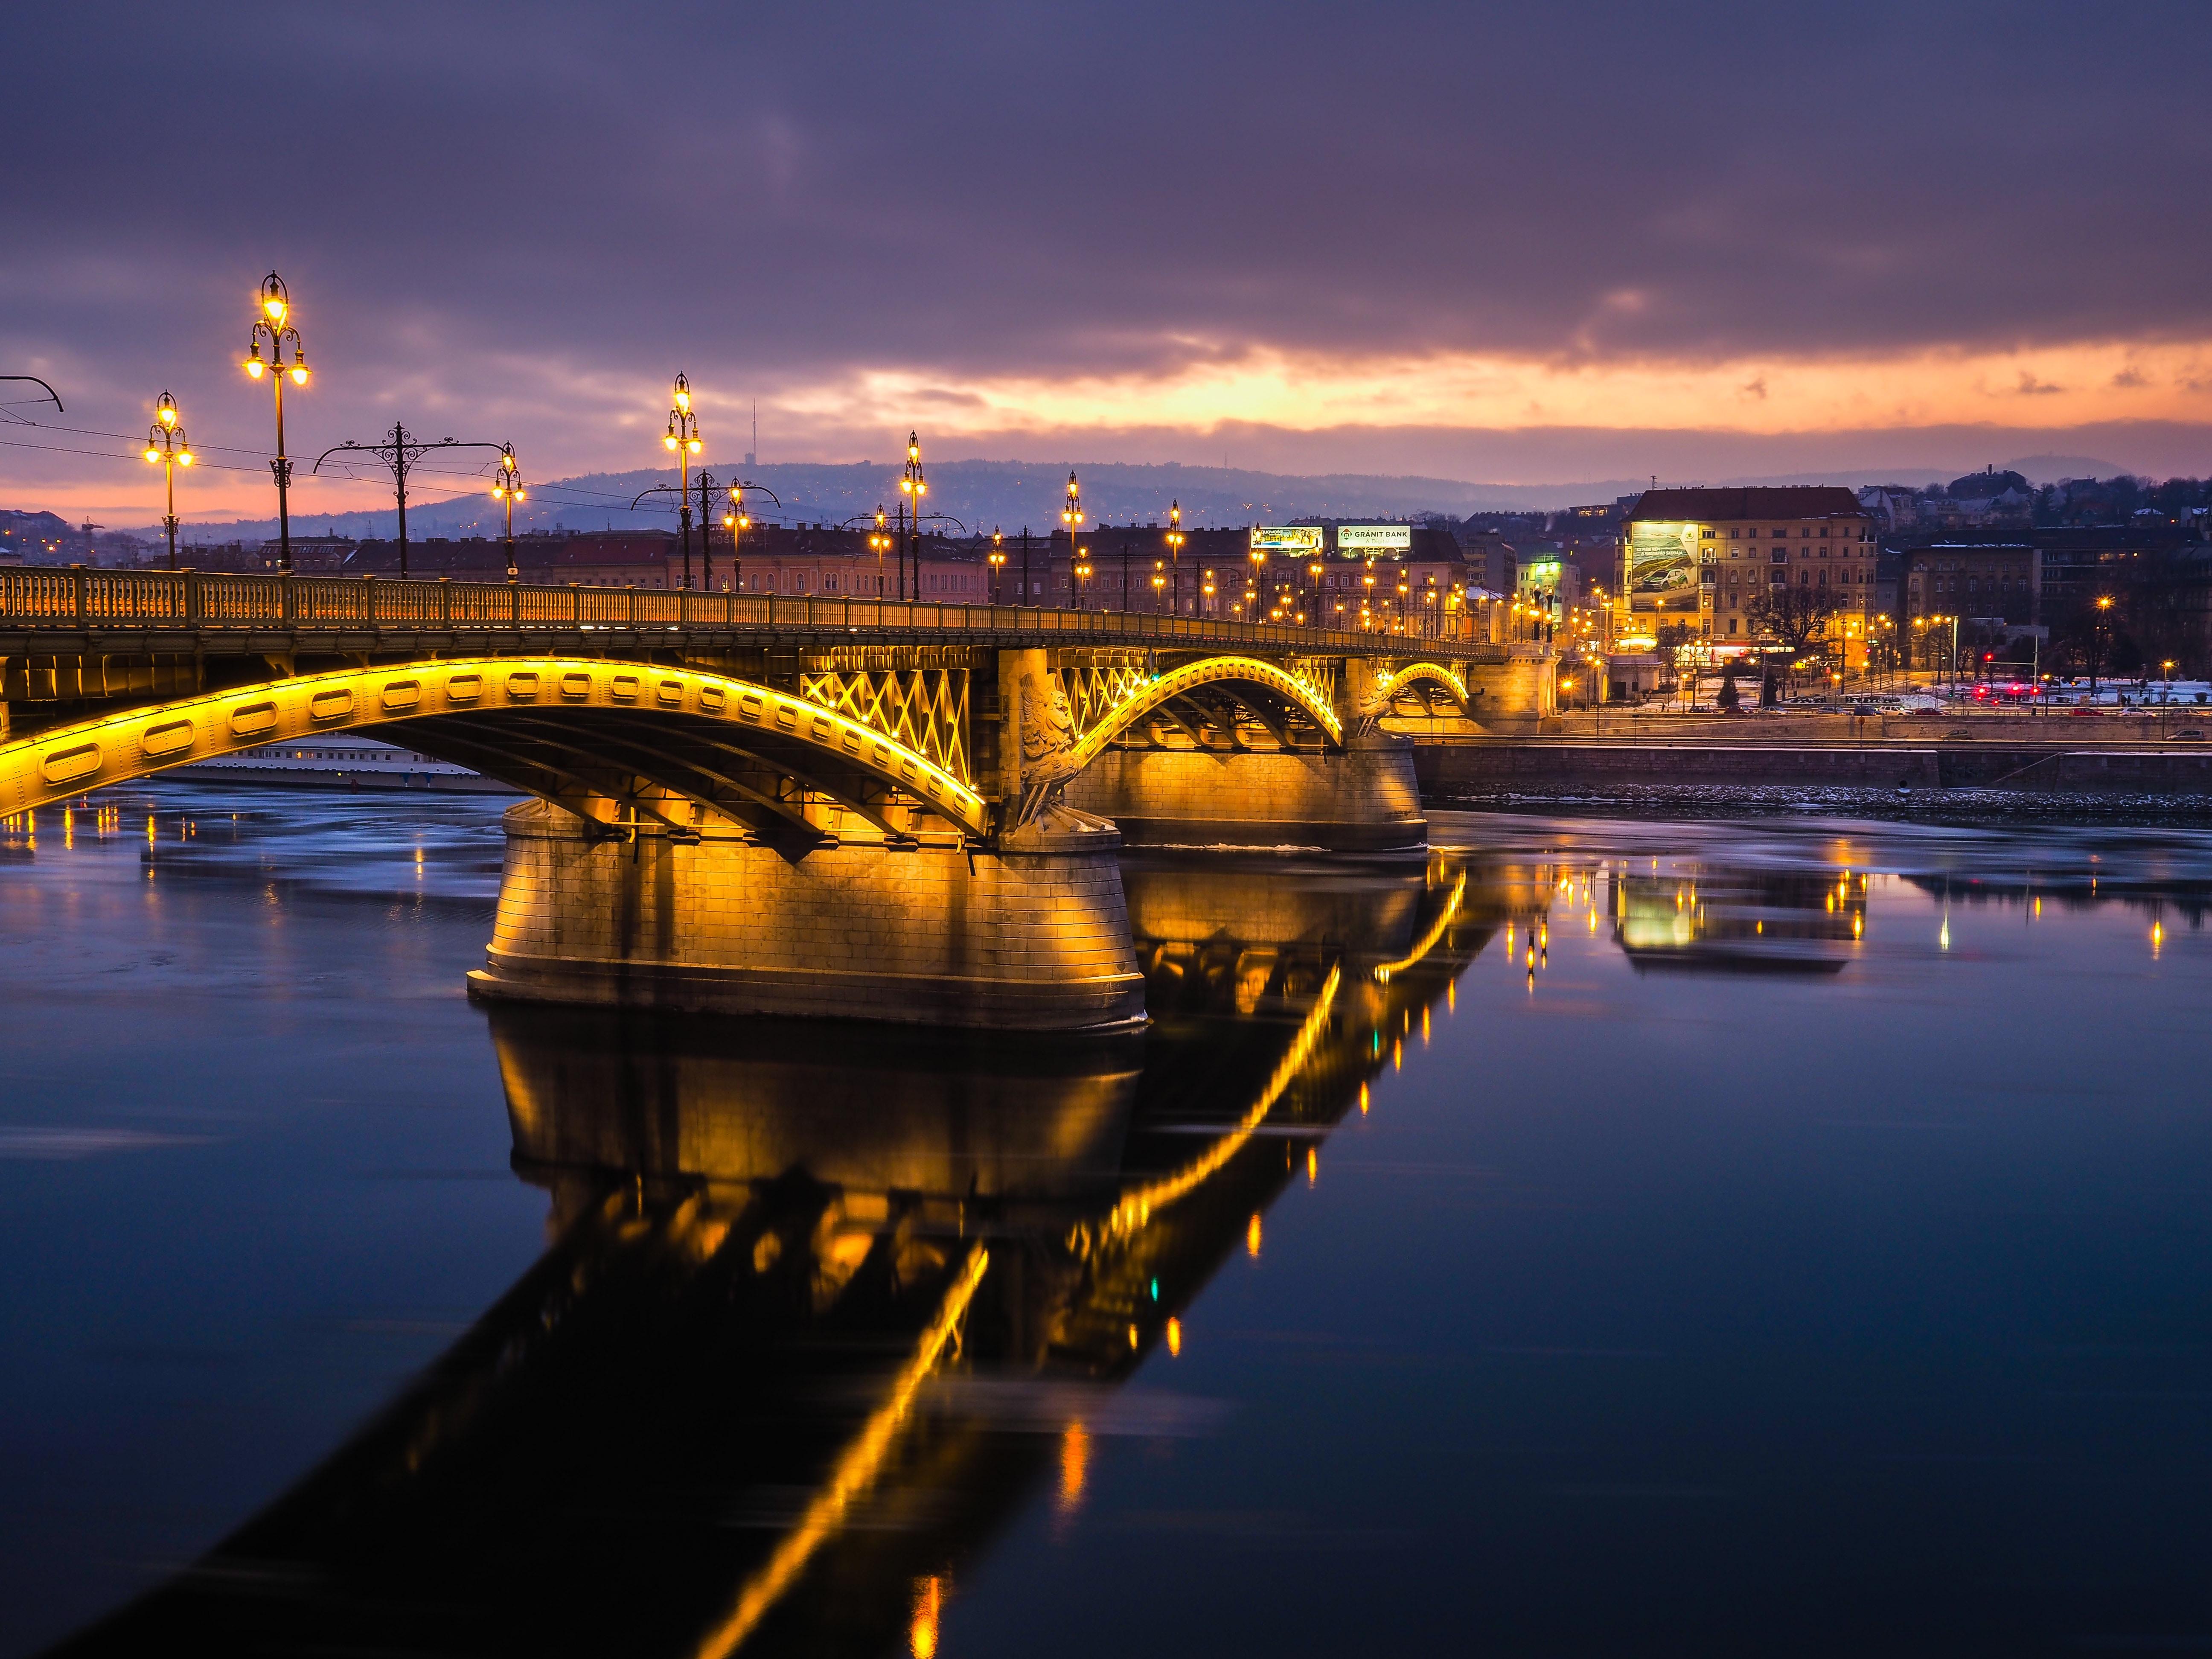 lighted concrete bridge near buildings